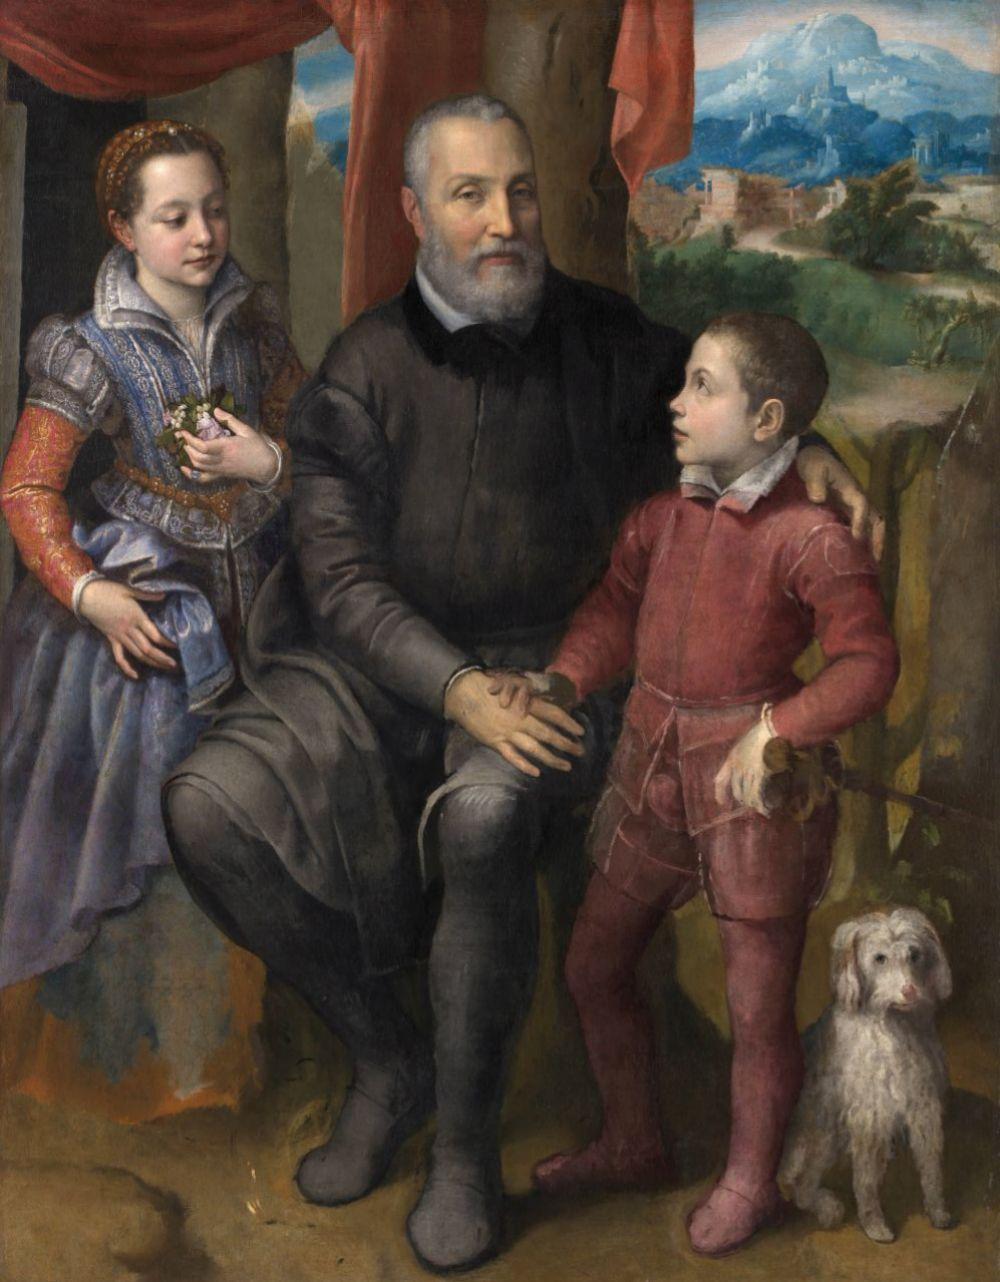 Retrato de familia, de Sofonisba Anguissola, 1558